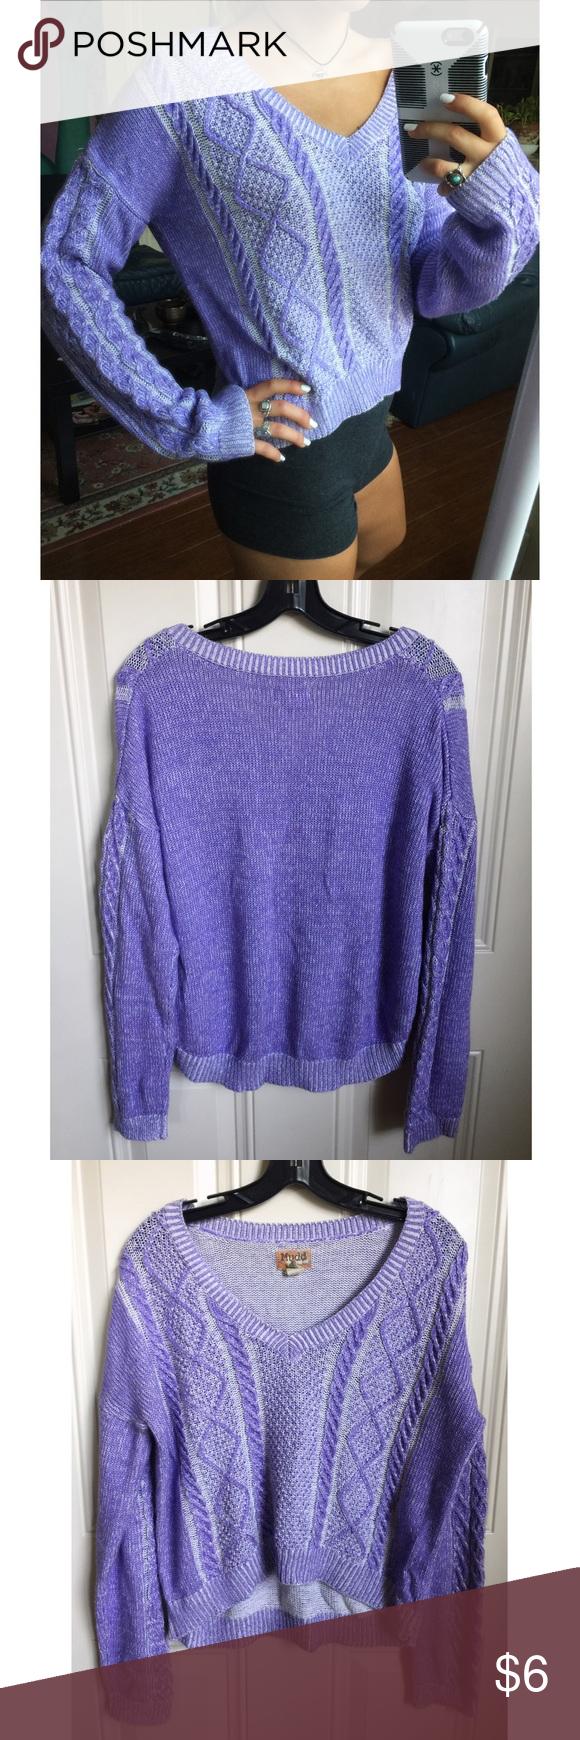 Cute Light Purple V-Neck Sweater | Light purple, Weather and Shorts